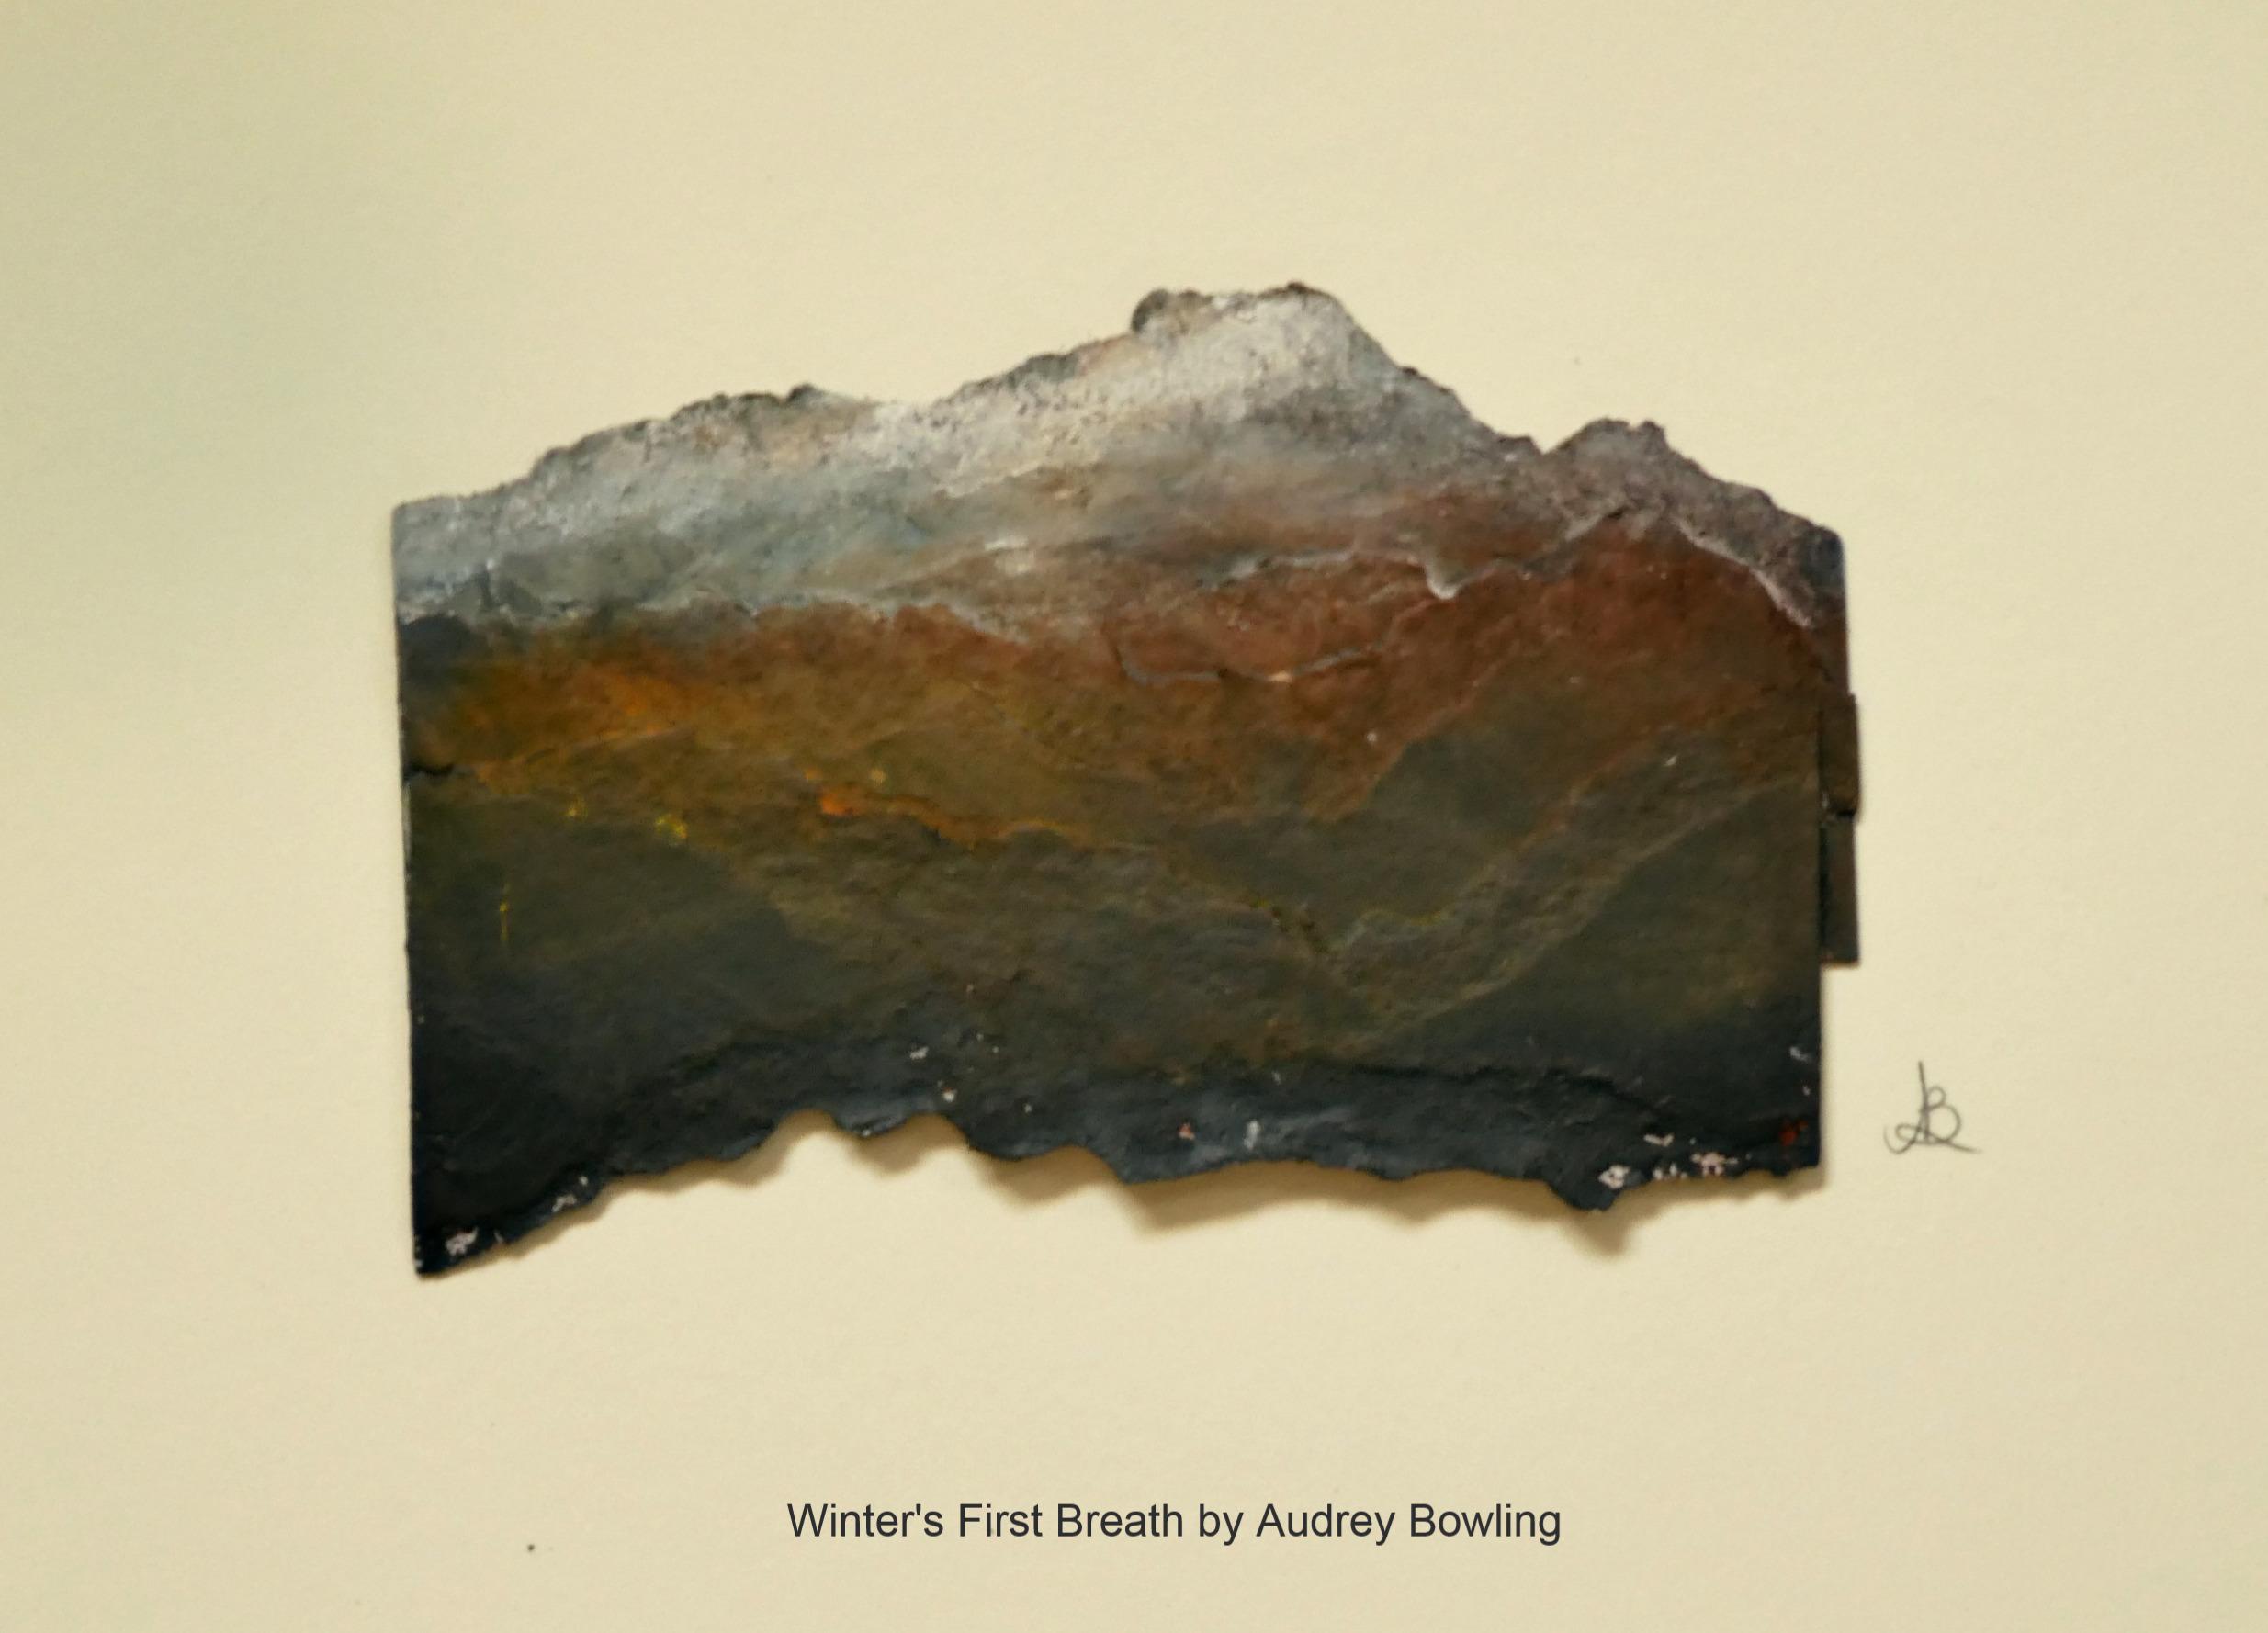 Winter's First Breath